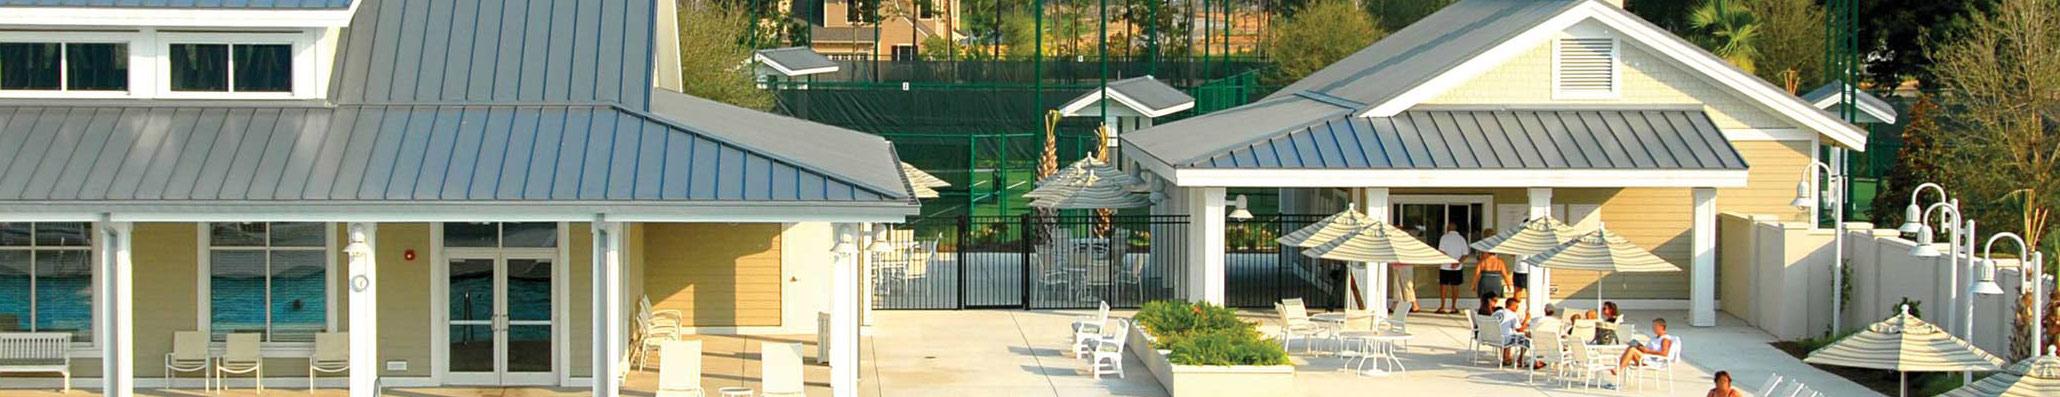 amenities_wellnesscenter_longer